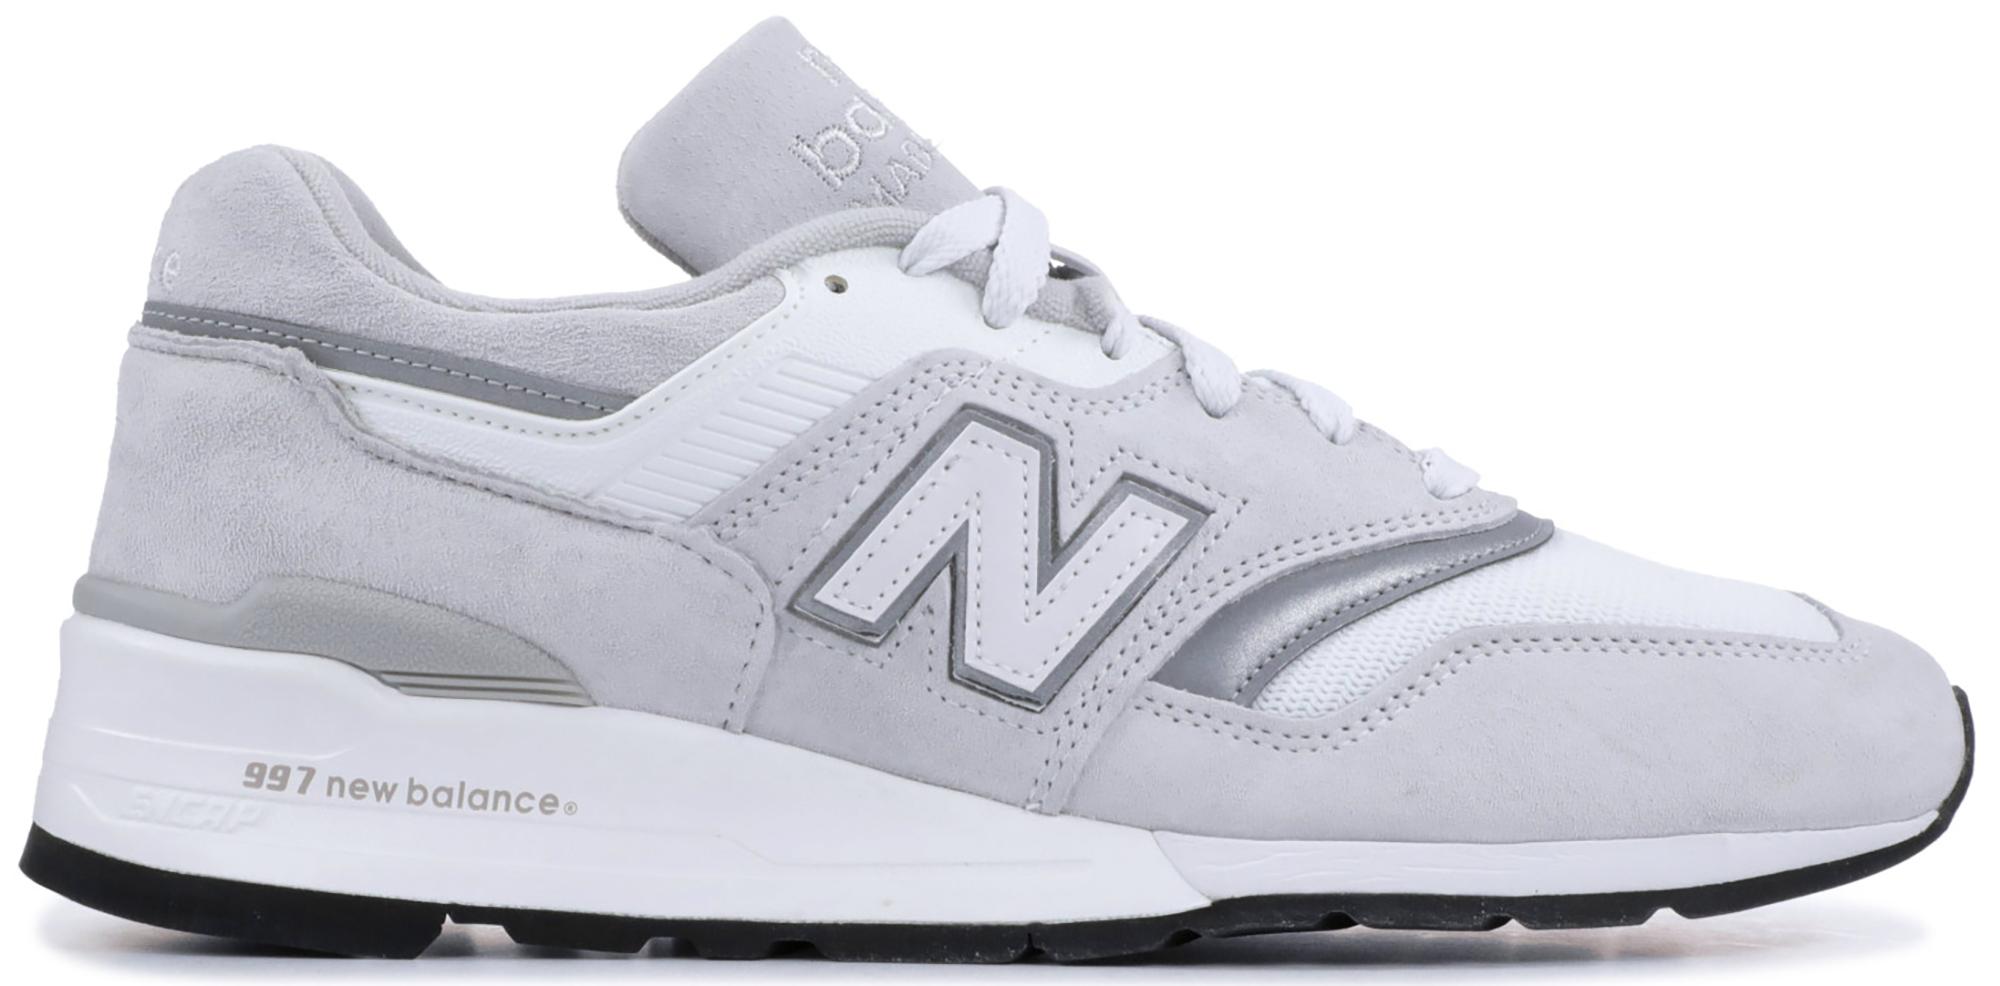 997 new balance grey